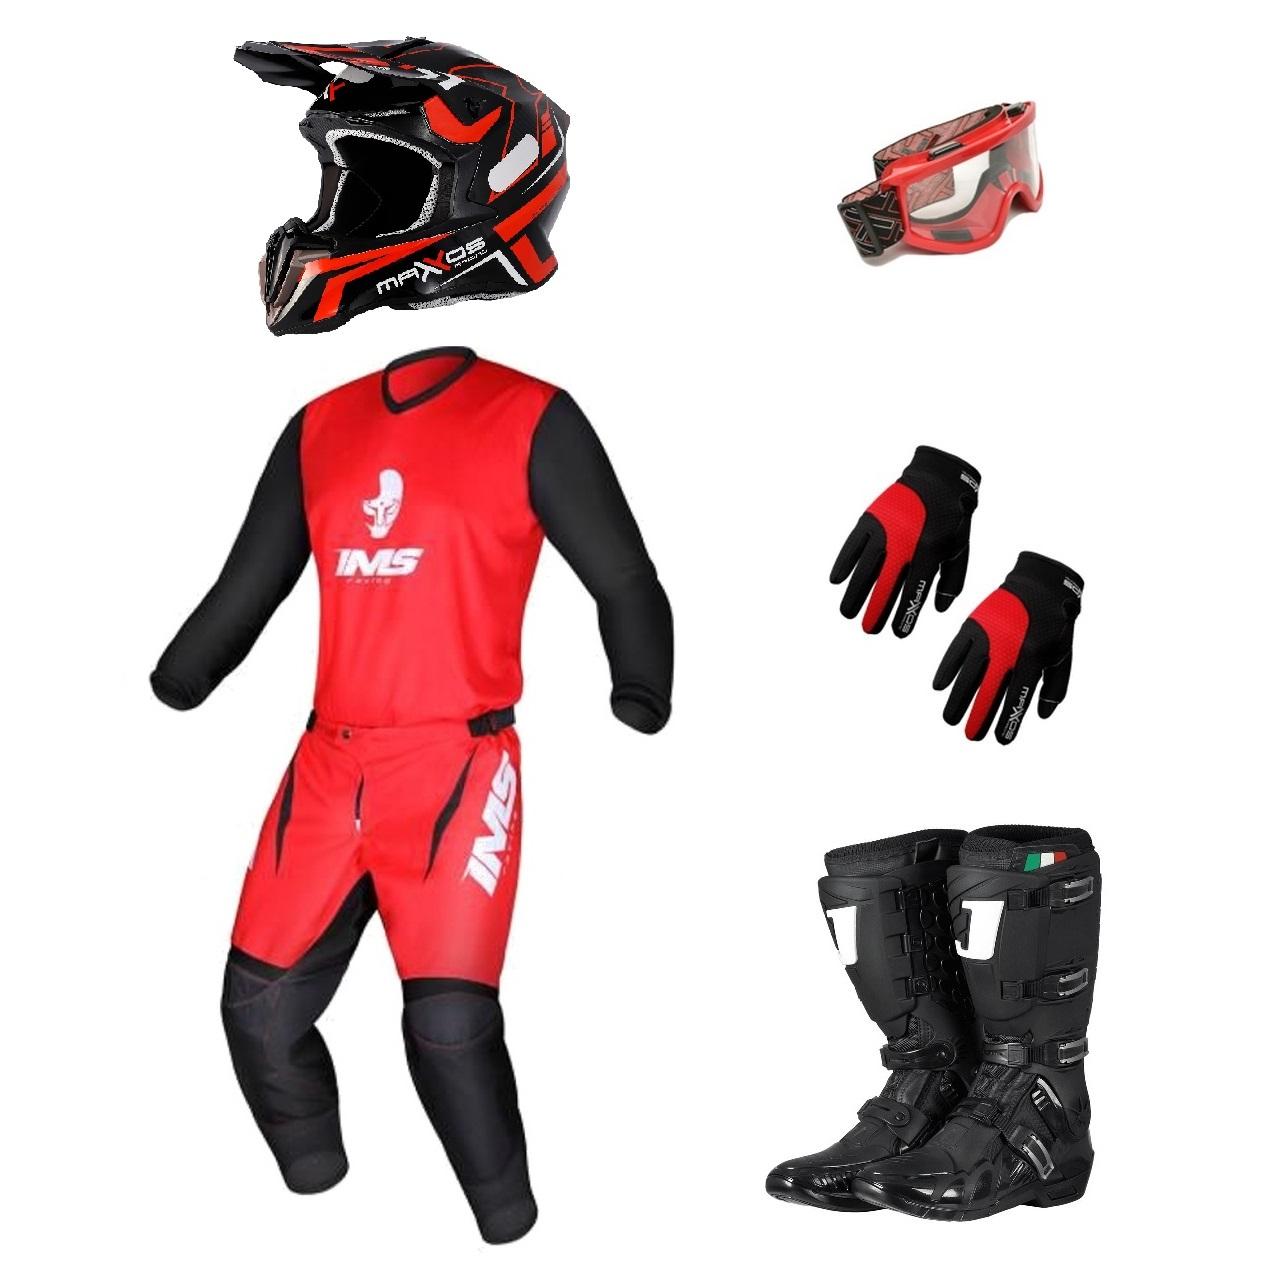 Kit Equipamento Trilha Motocross Enduro Basic 1 - Vermelho